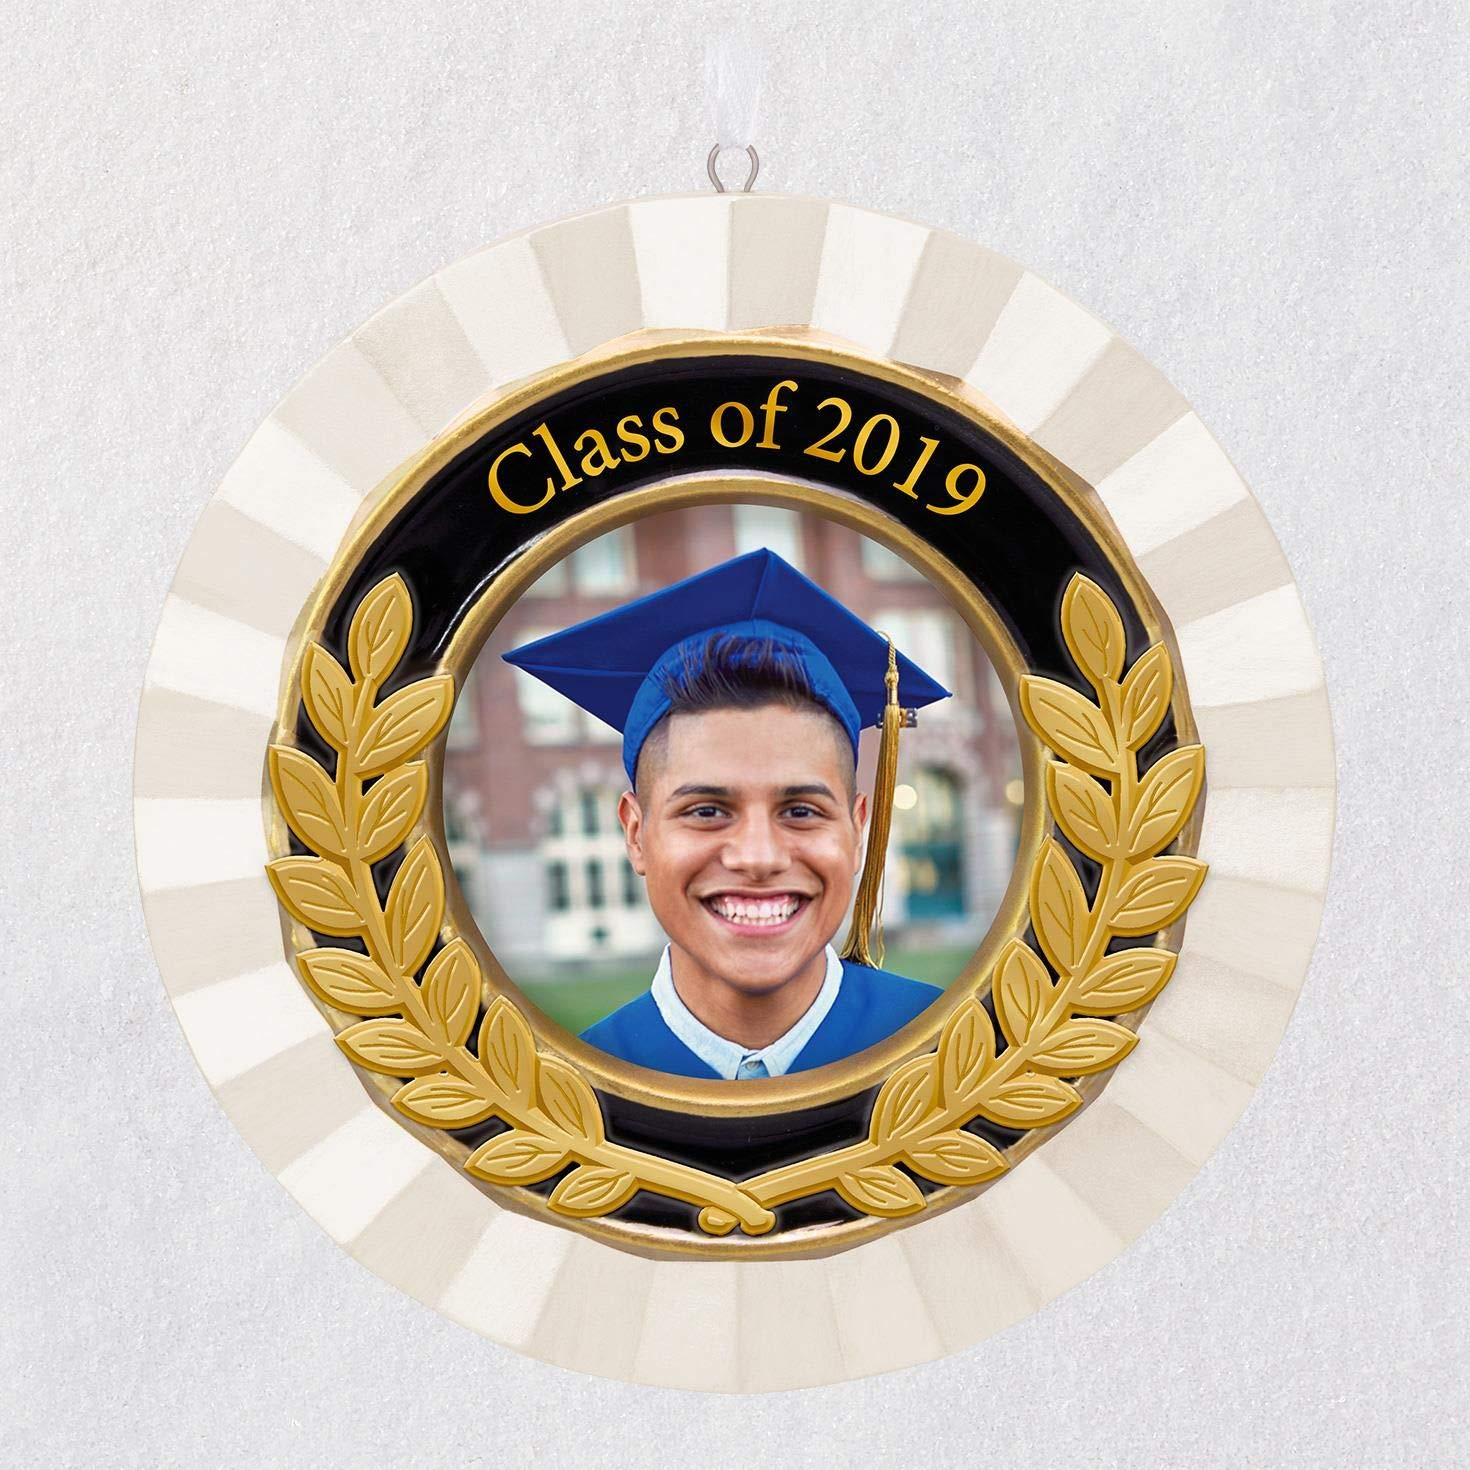 Hallmark Keepsake Christmas Ornament 2019 Year Dated''''Congrats, Grad!'' Picture Frame Porcelain and Metal, Graduation